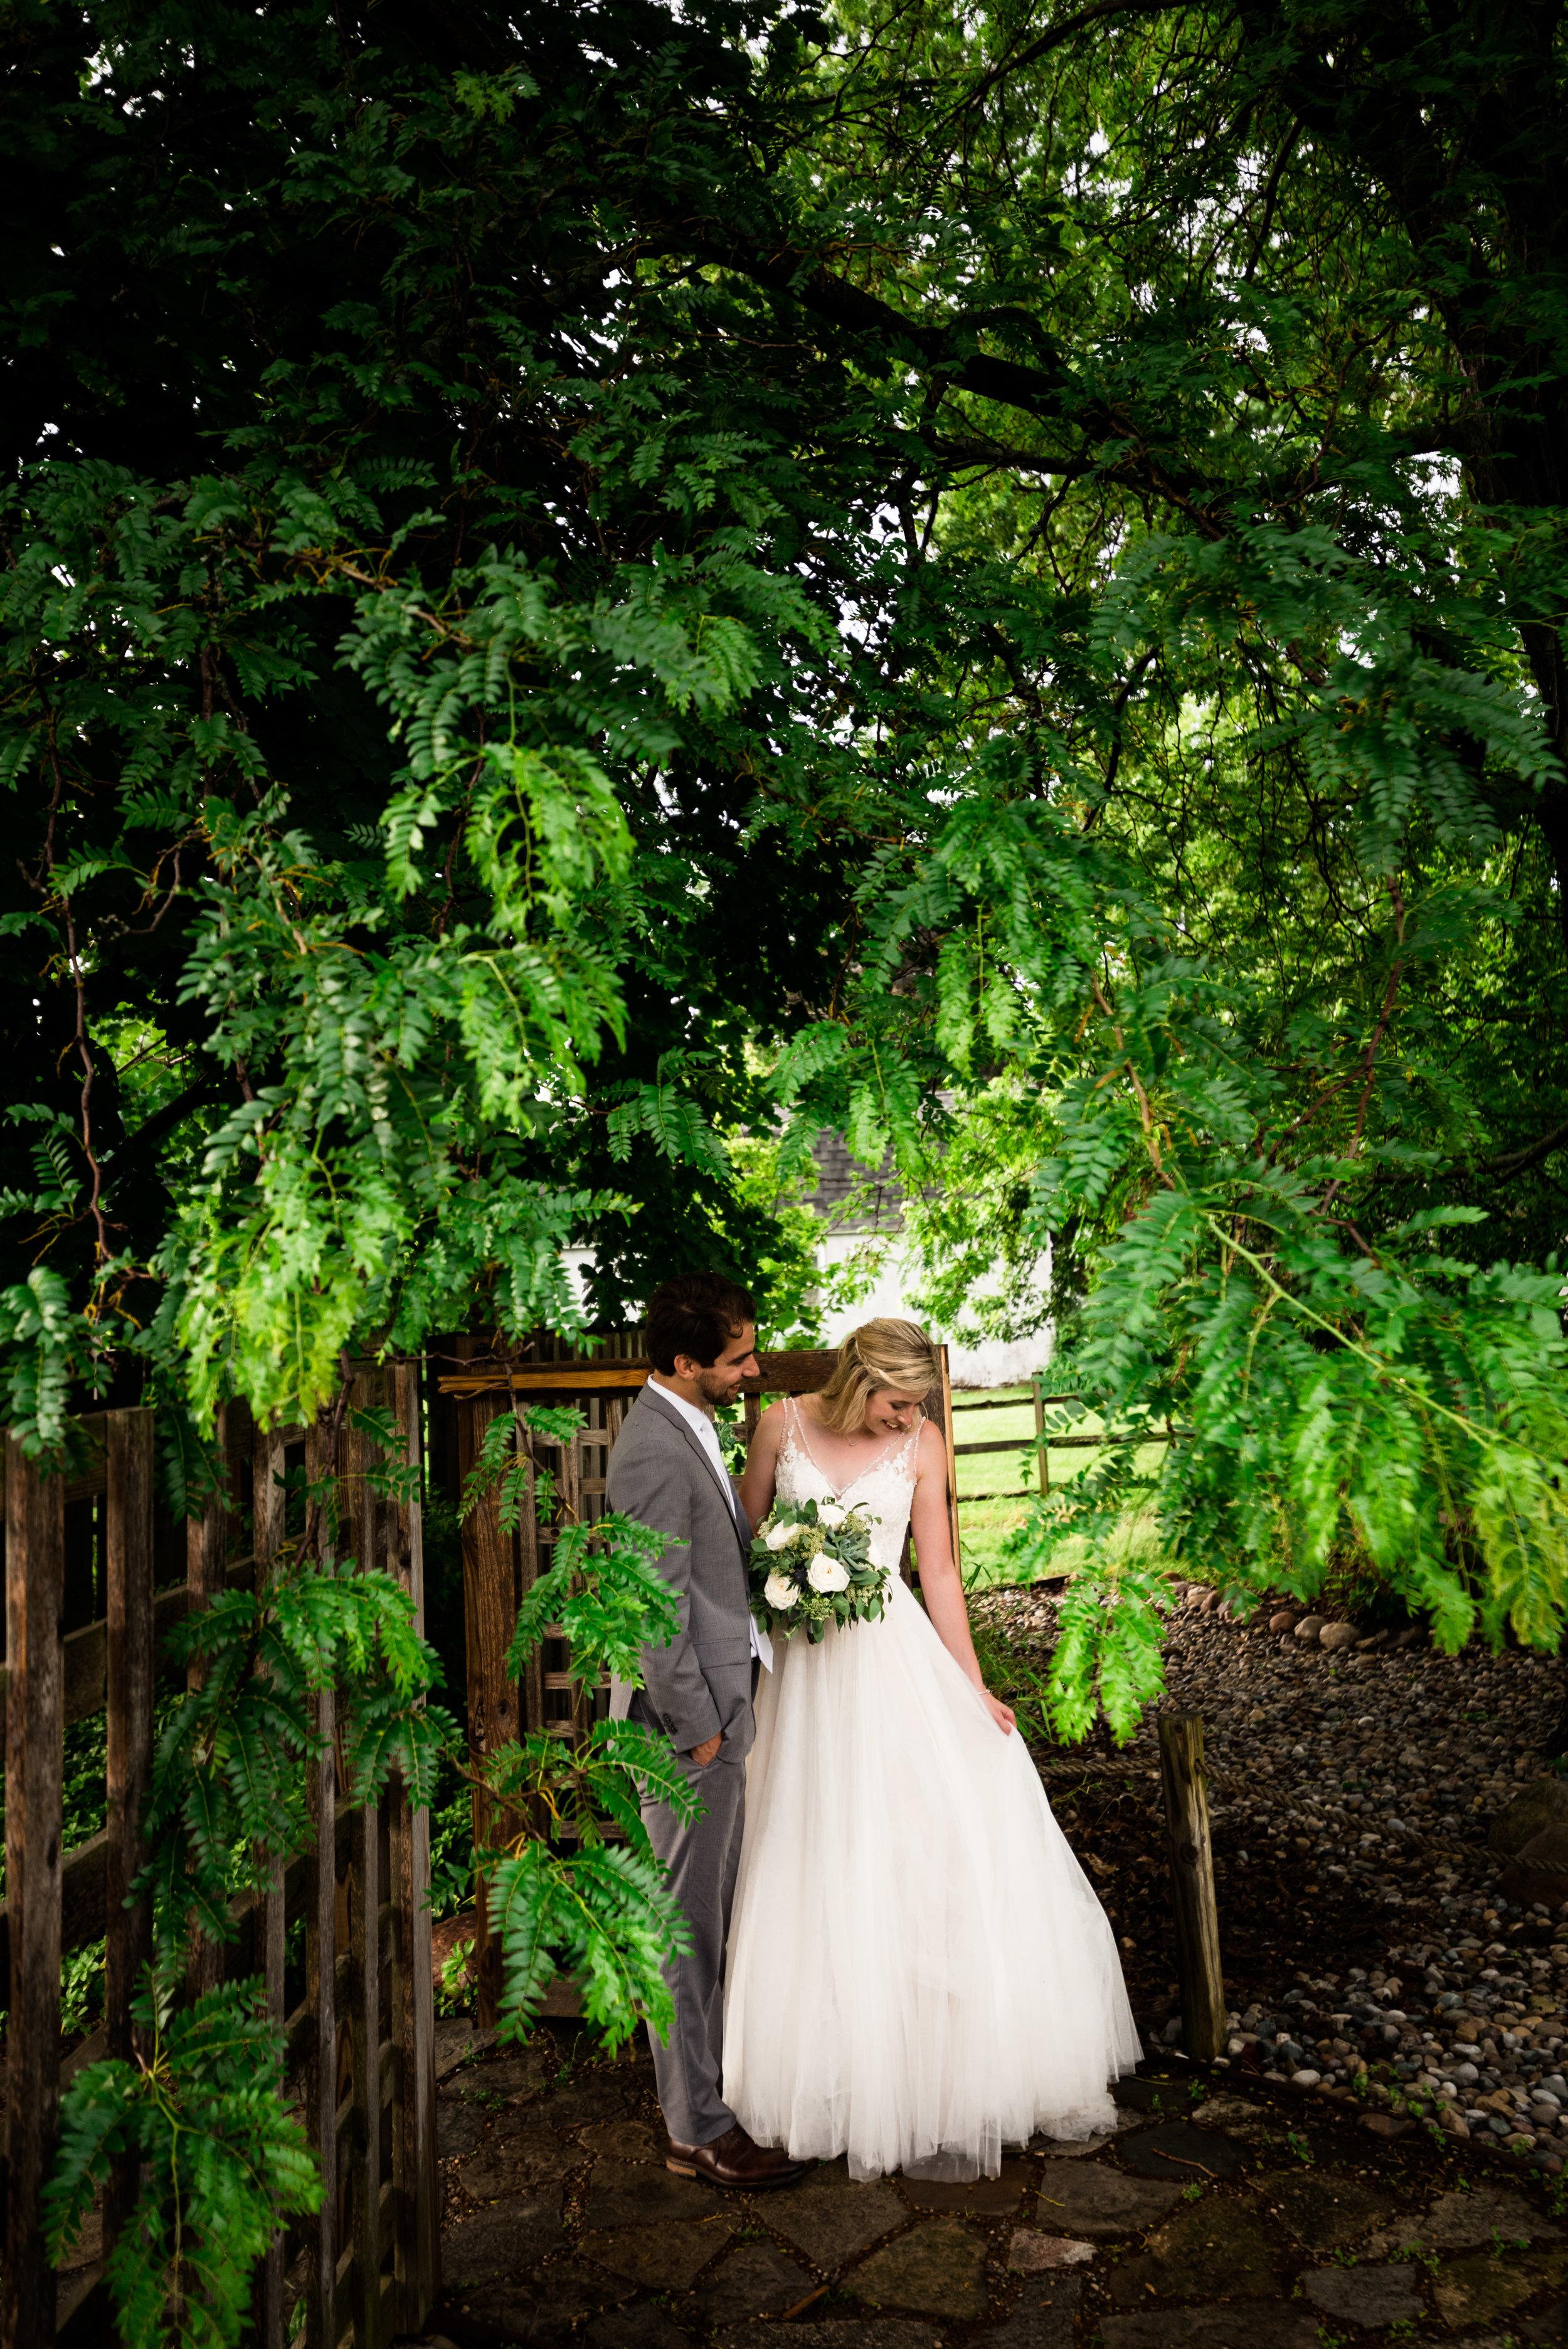 simpson garden park wedding photographer